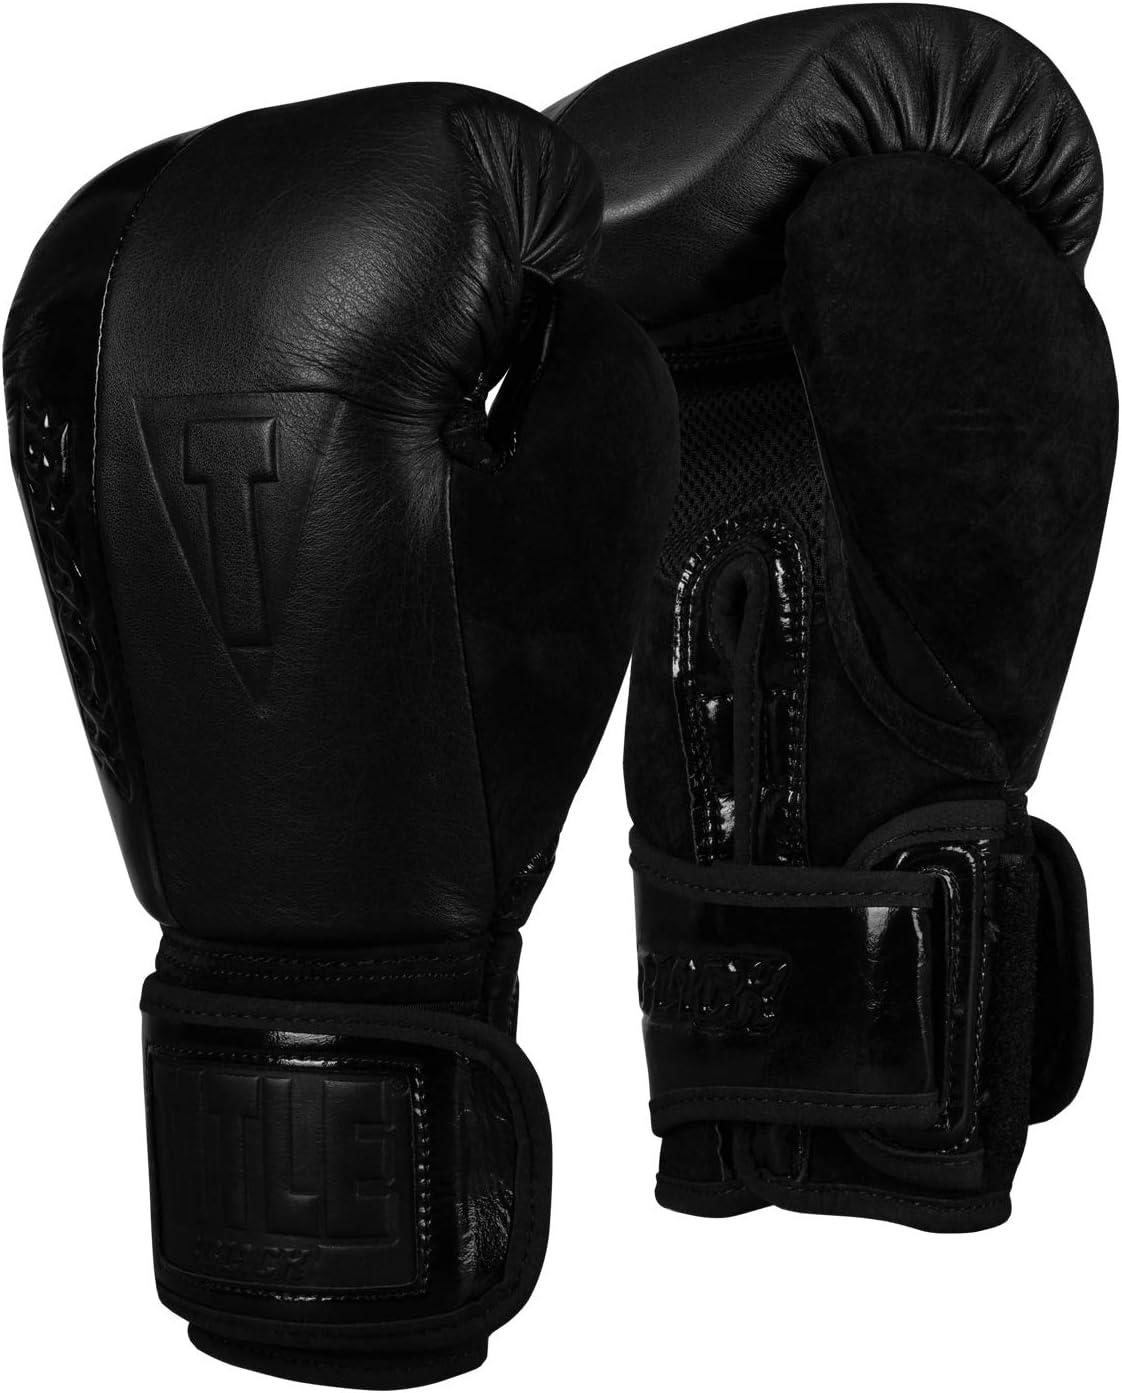 Title Portland Mall Black Blast Gloves Heavy shopping Bag